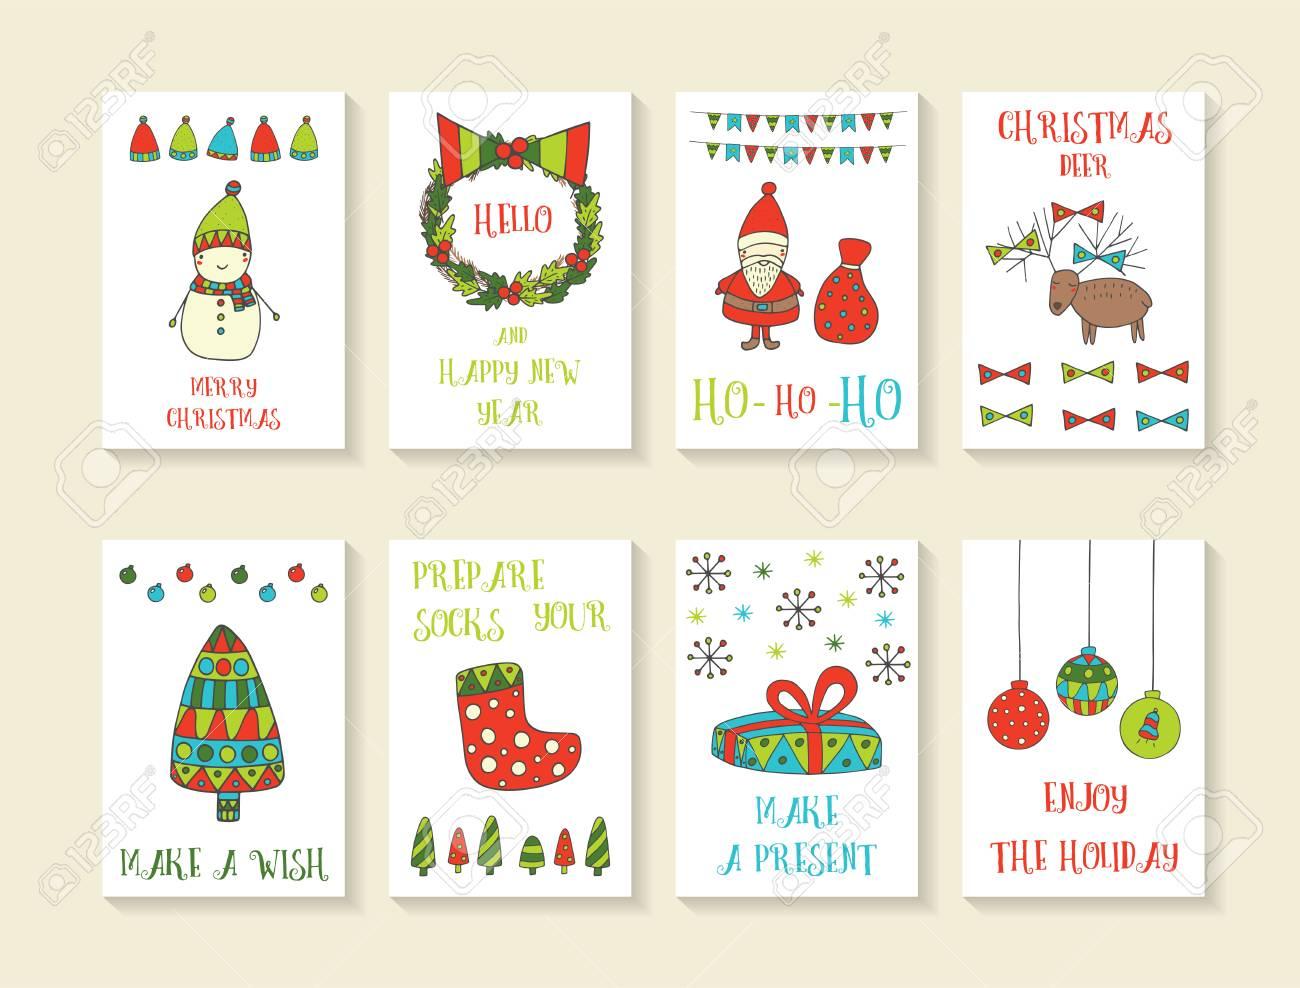 Cute Christmas Cards.Cute Hand Drawn Doodle Christmas Cards Brochures Postcards